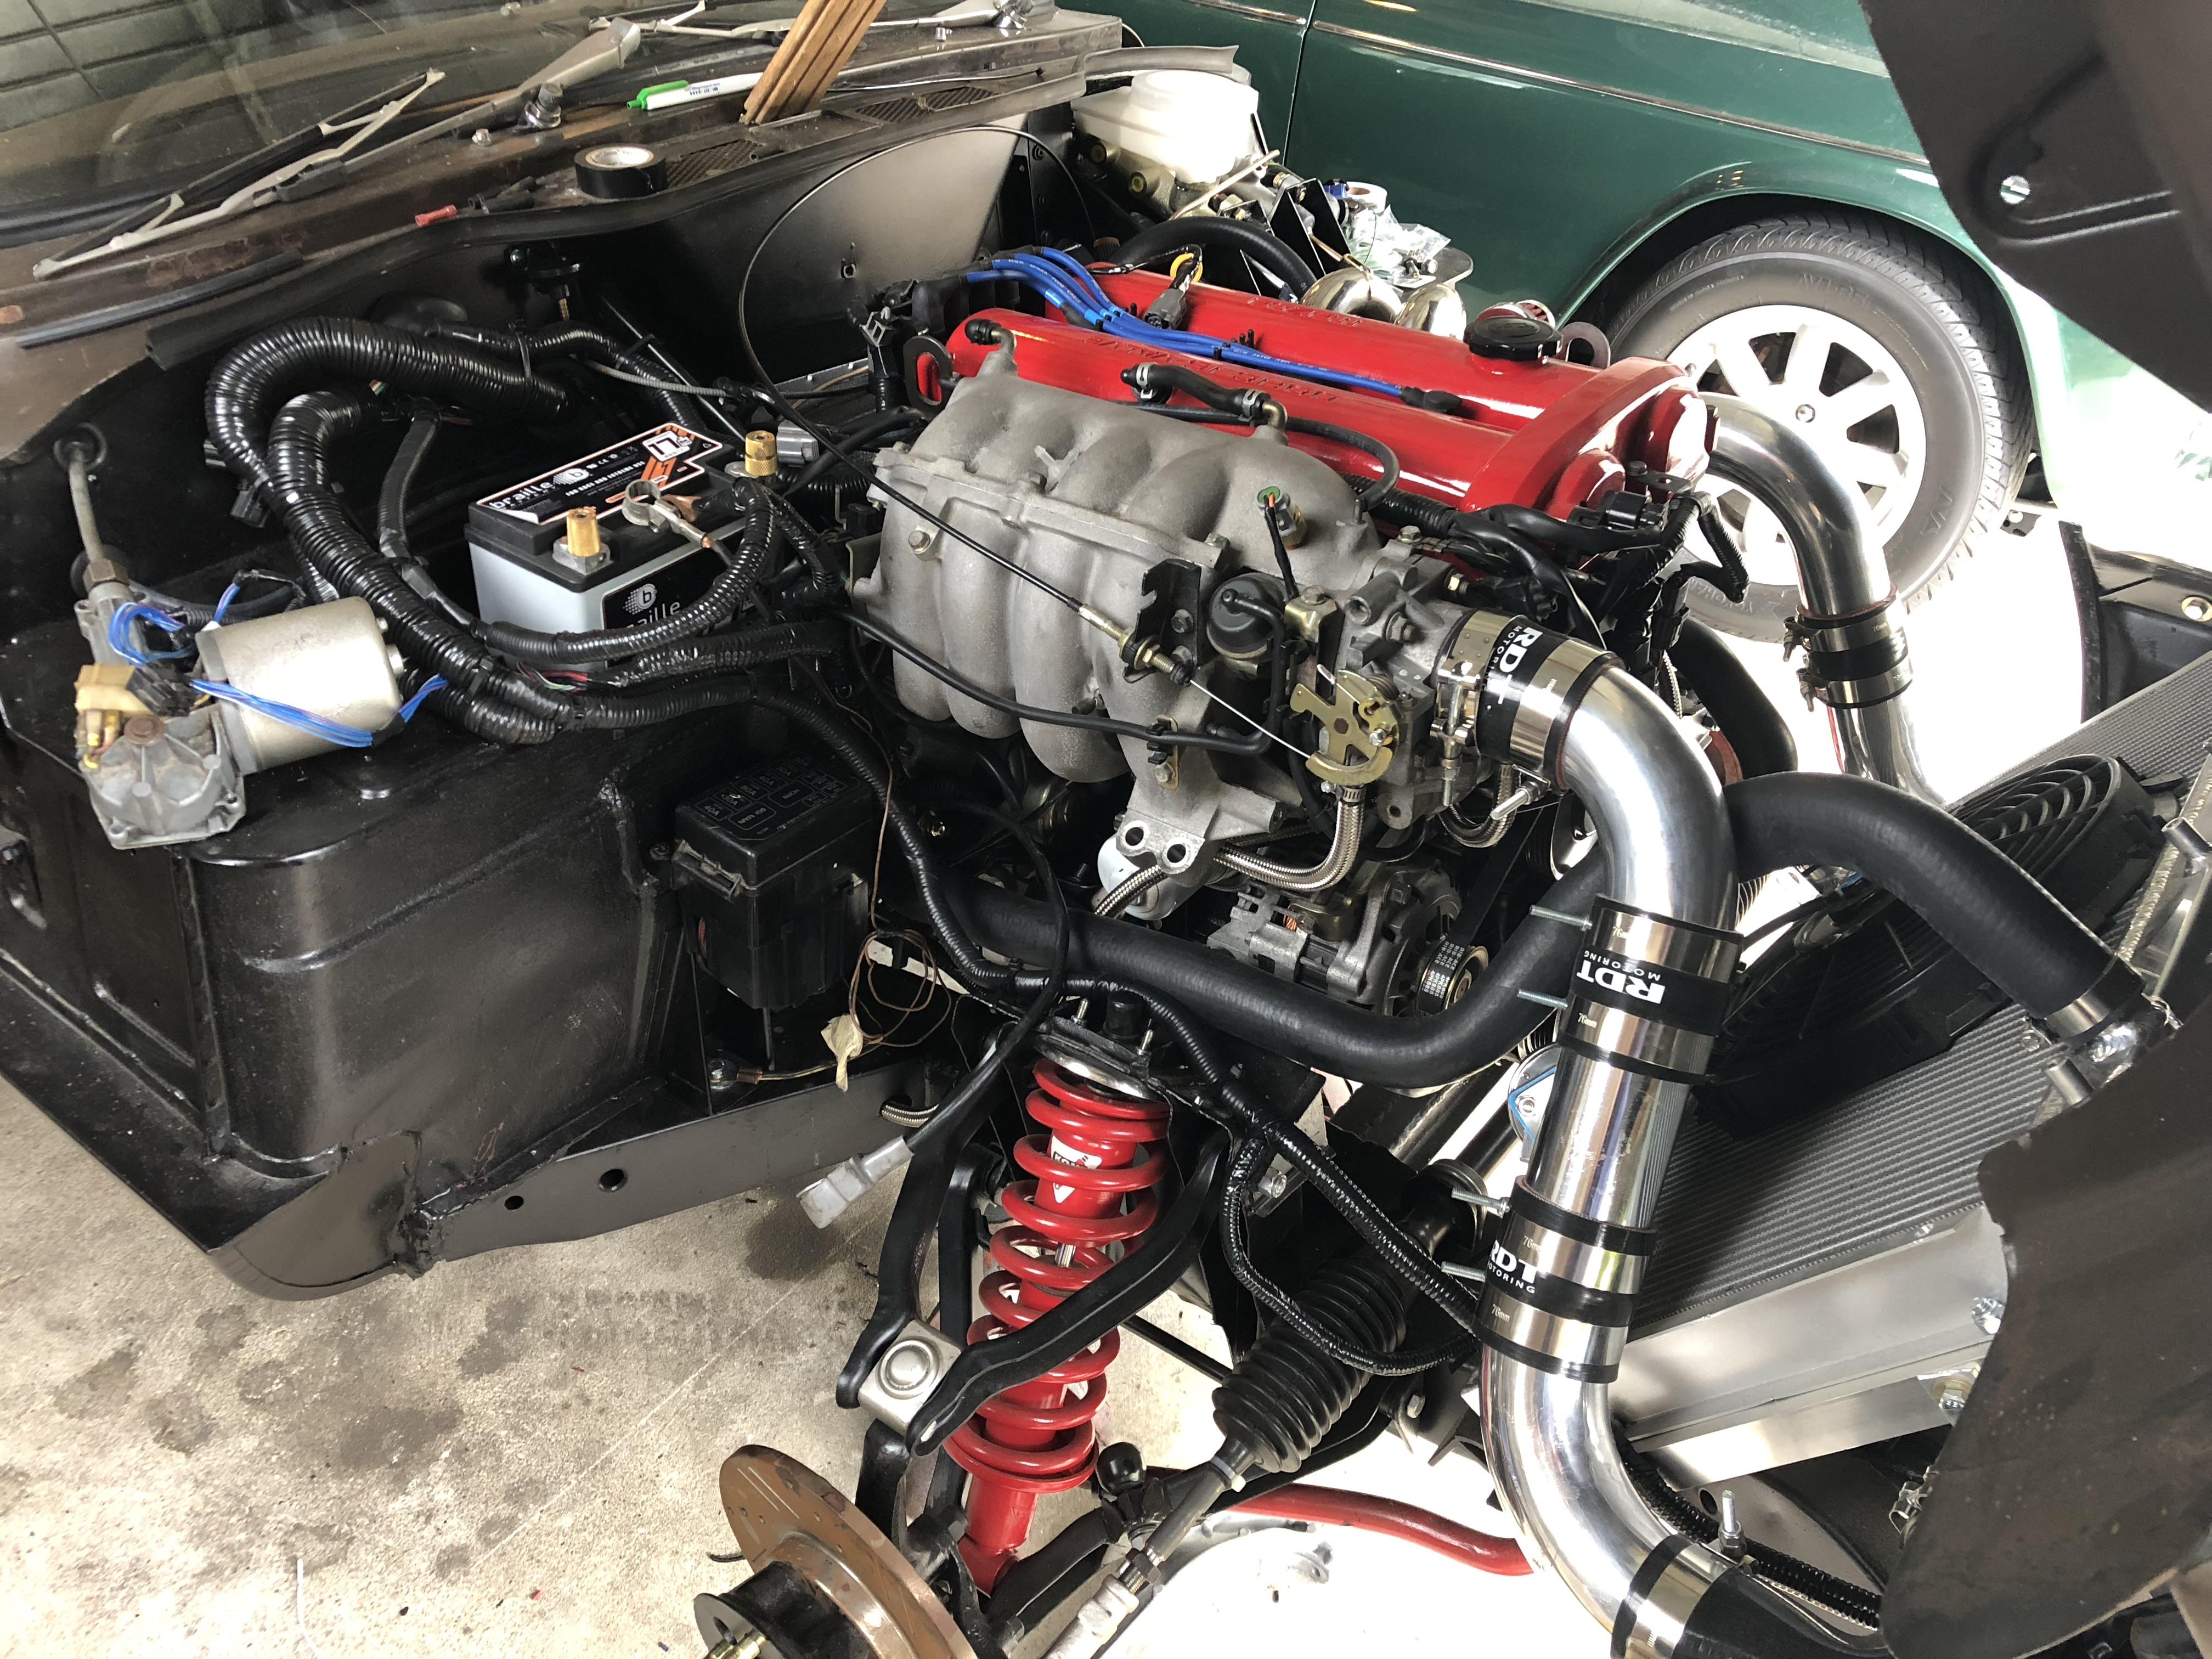 Engine Swap And Setup For Track Days Triumph Performance Forum